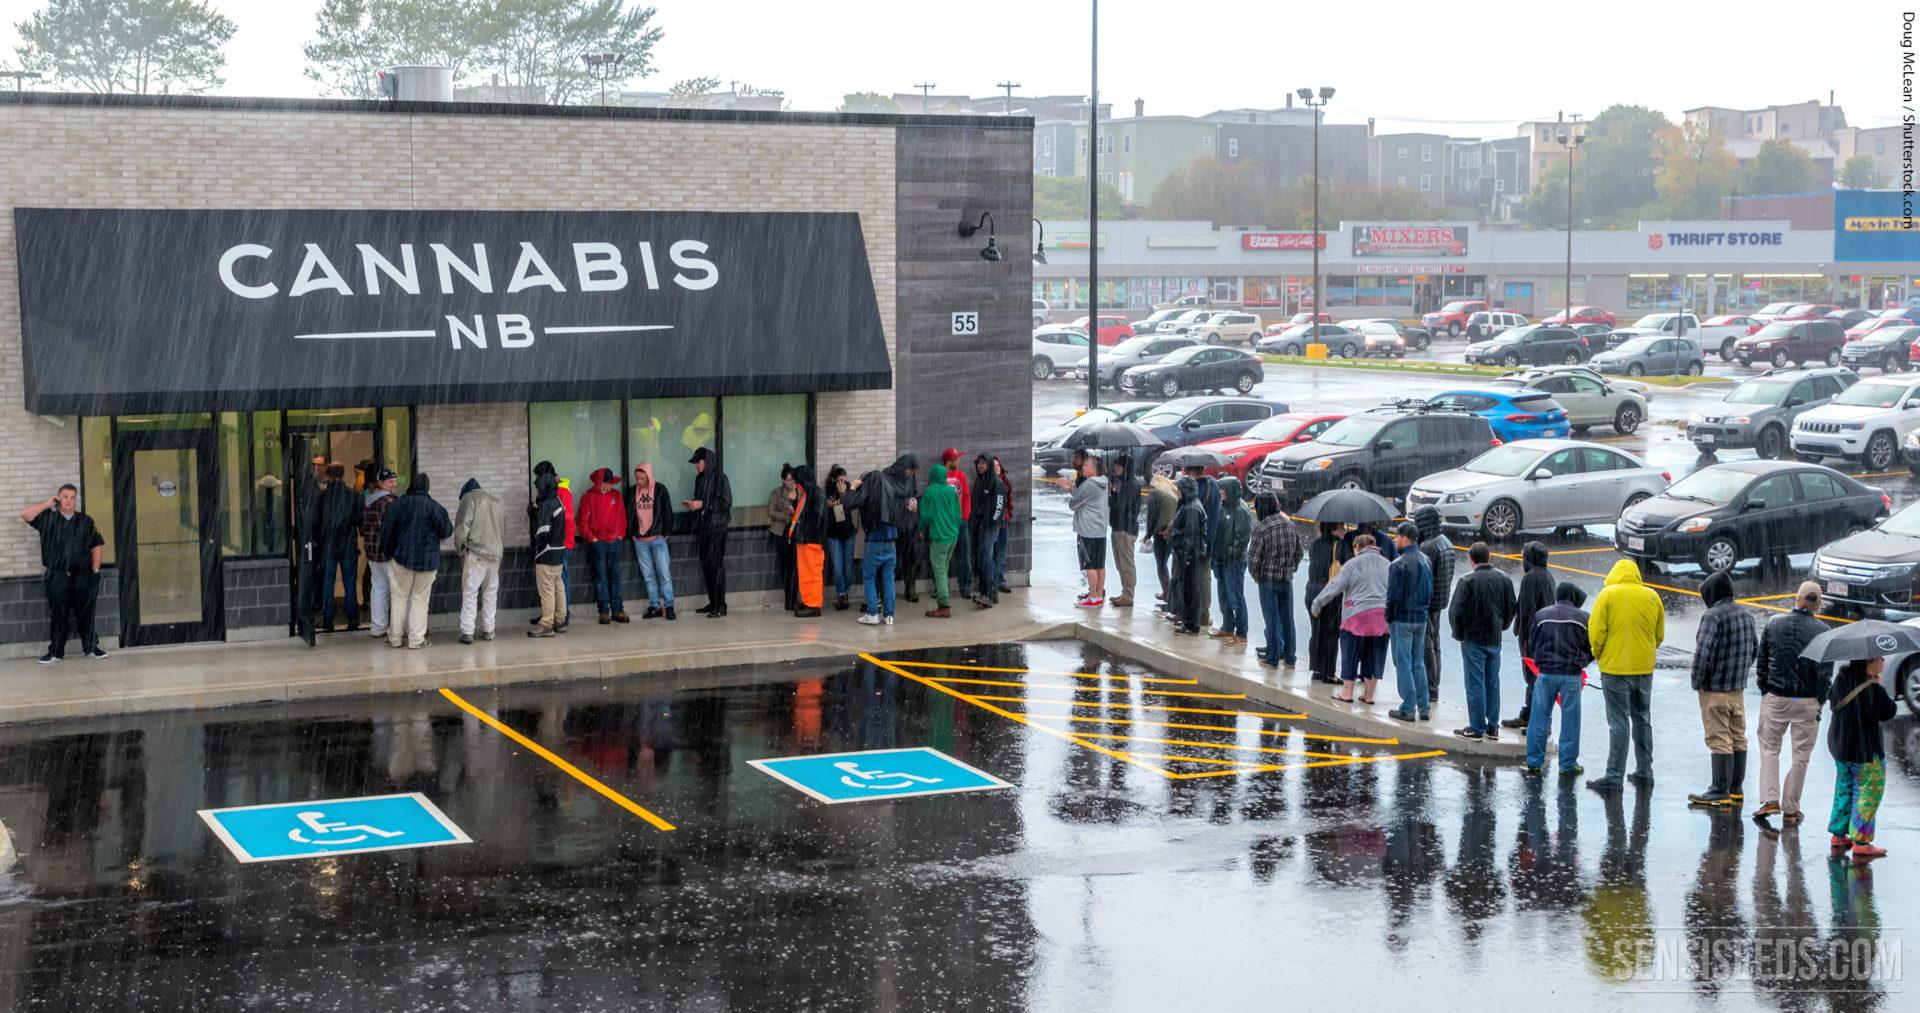 Confronting Canada's Cannabis Shortage